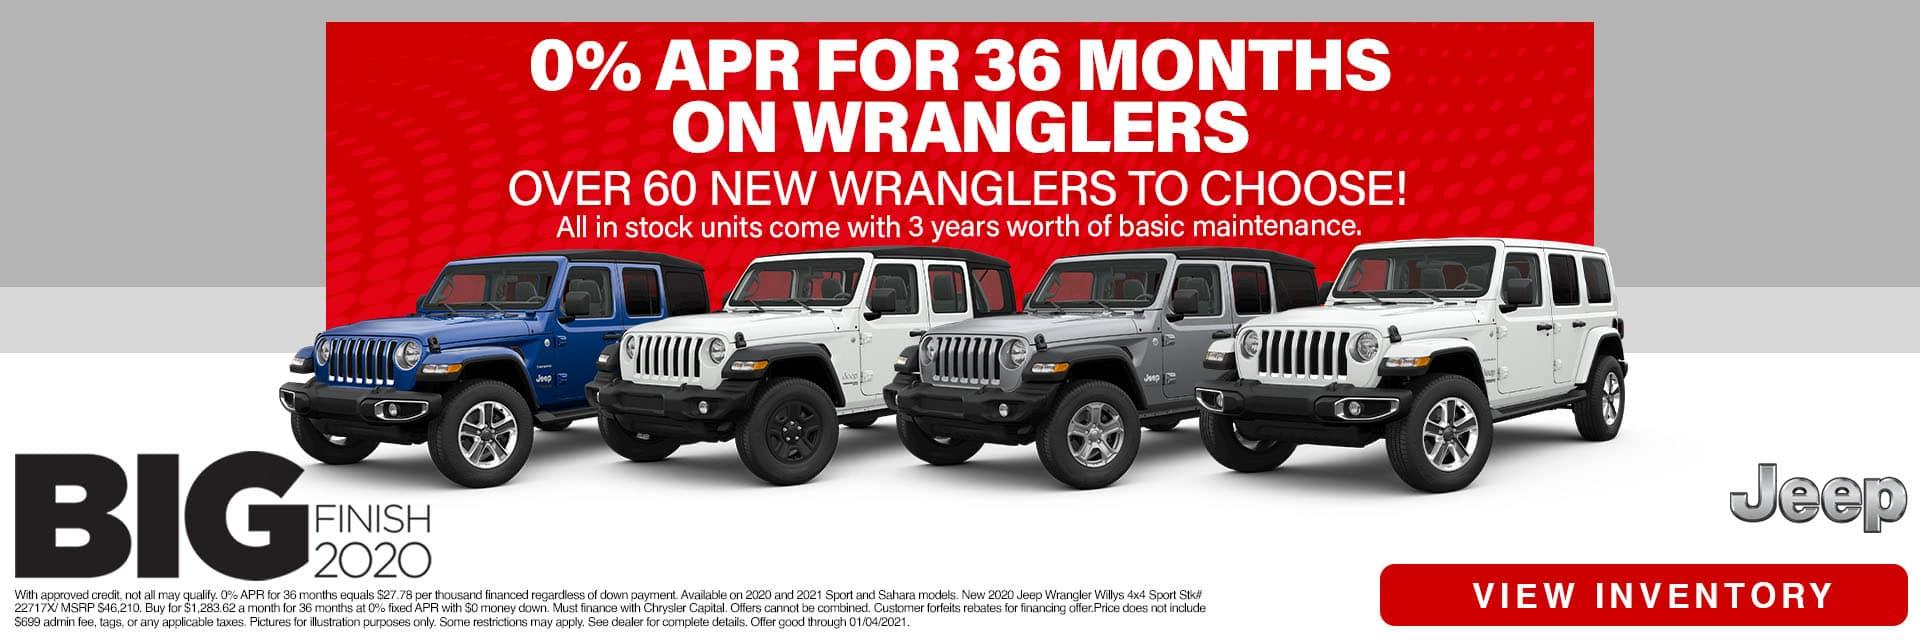 CLGO-December 2020-2020 Jeep Wrangler